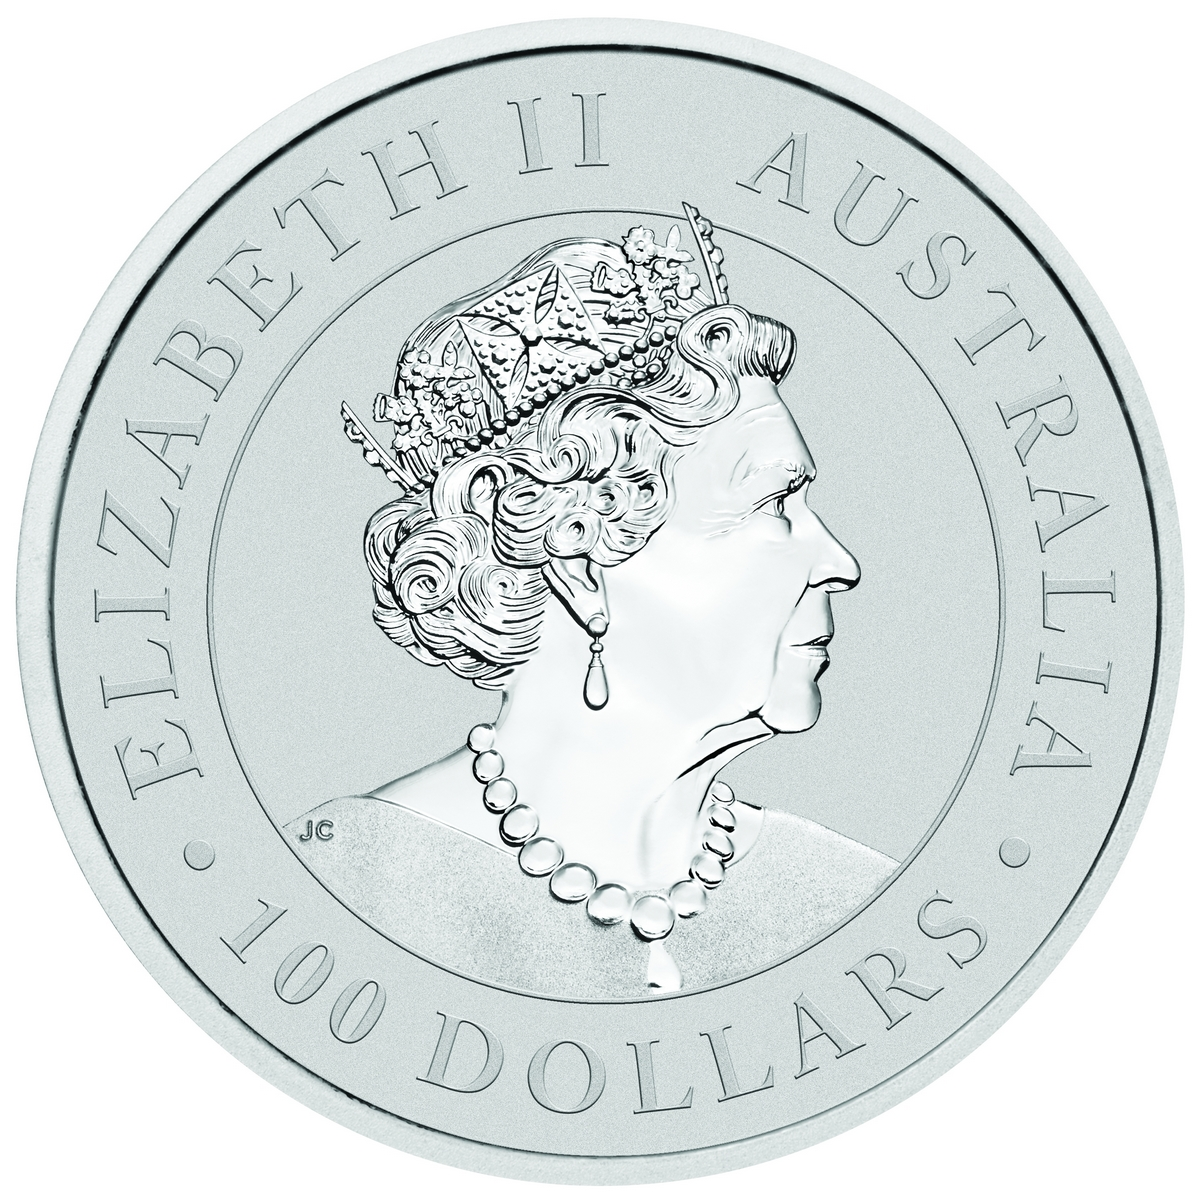 1 Unze (oz) Australian Kangaroo Platinmünzen